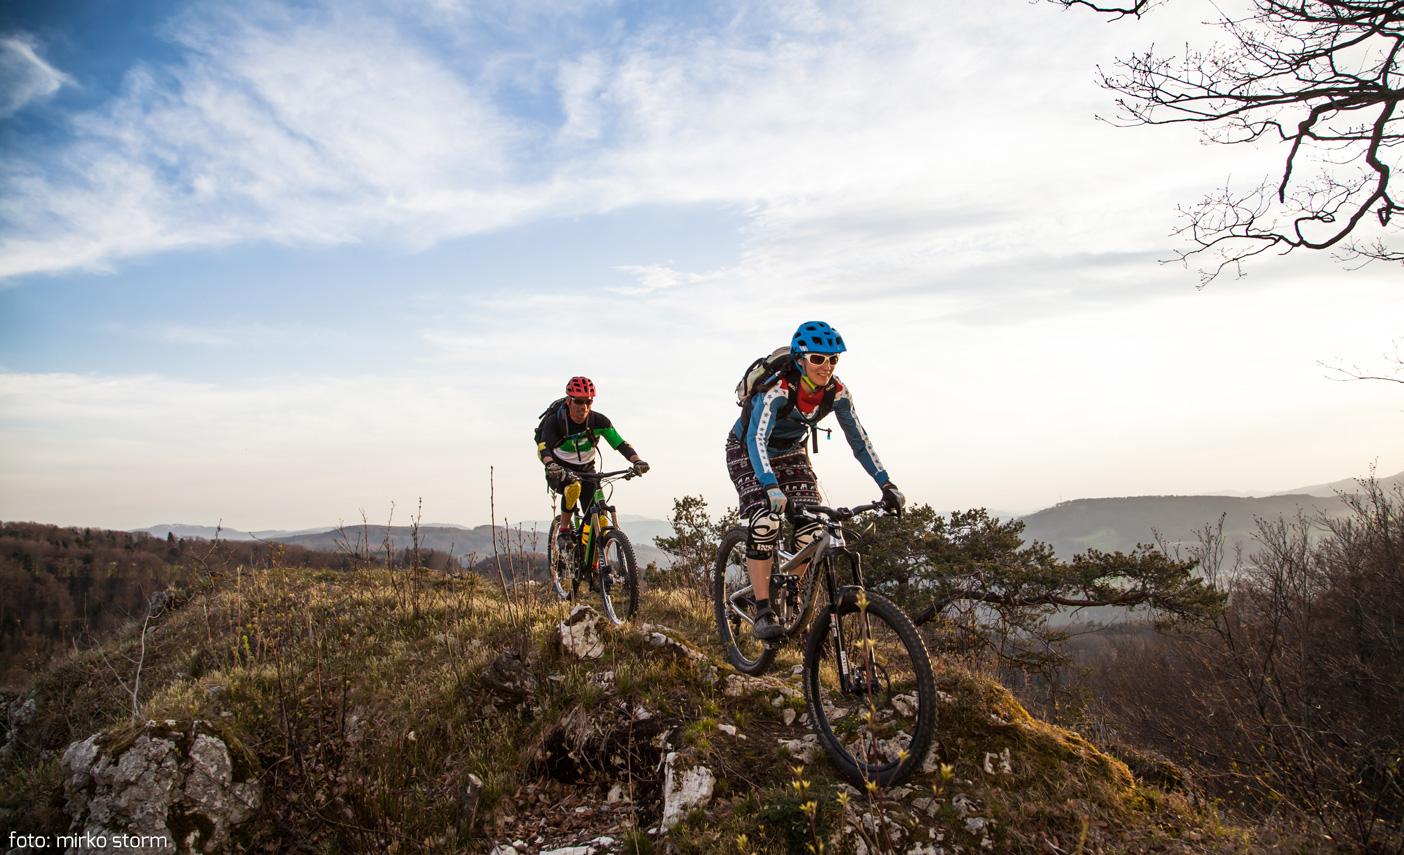 Happy mountain biking